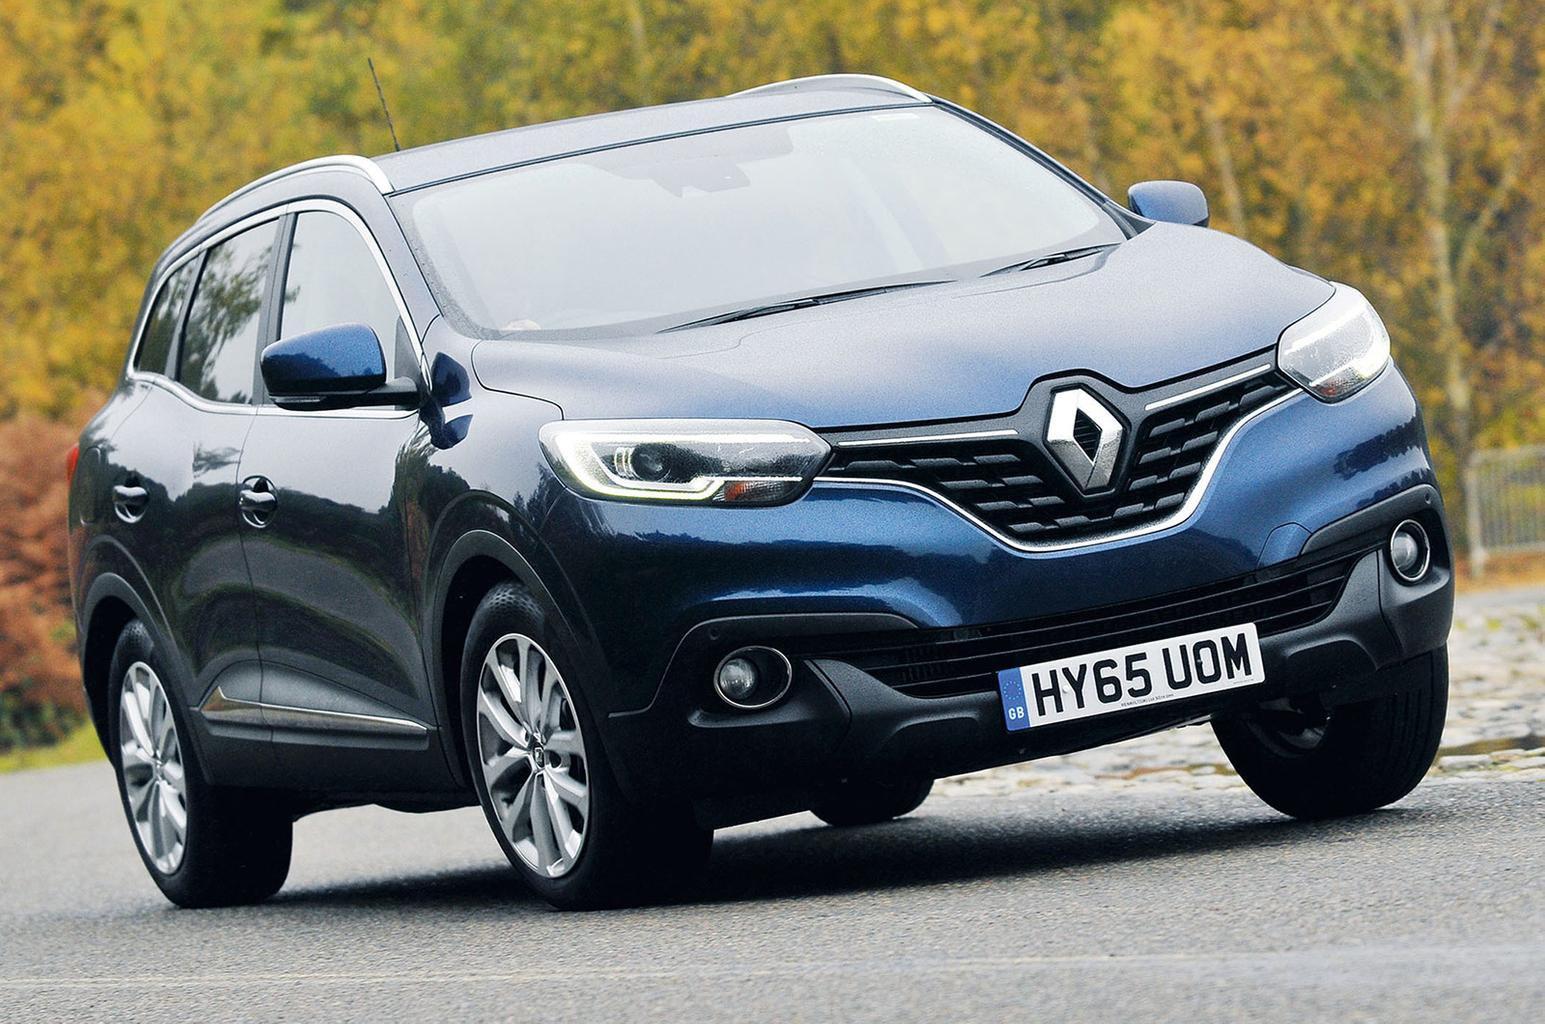 Deal of the day: Renault Kadjar